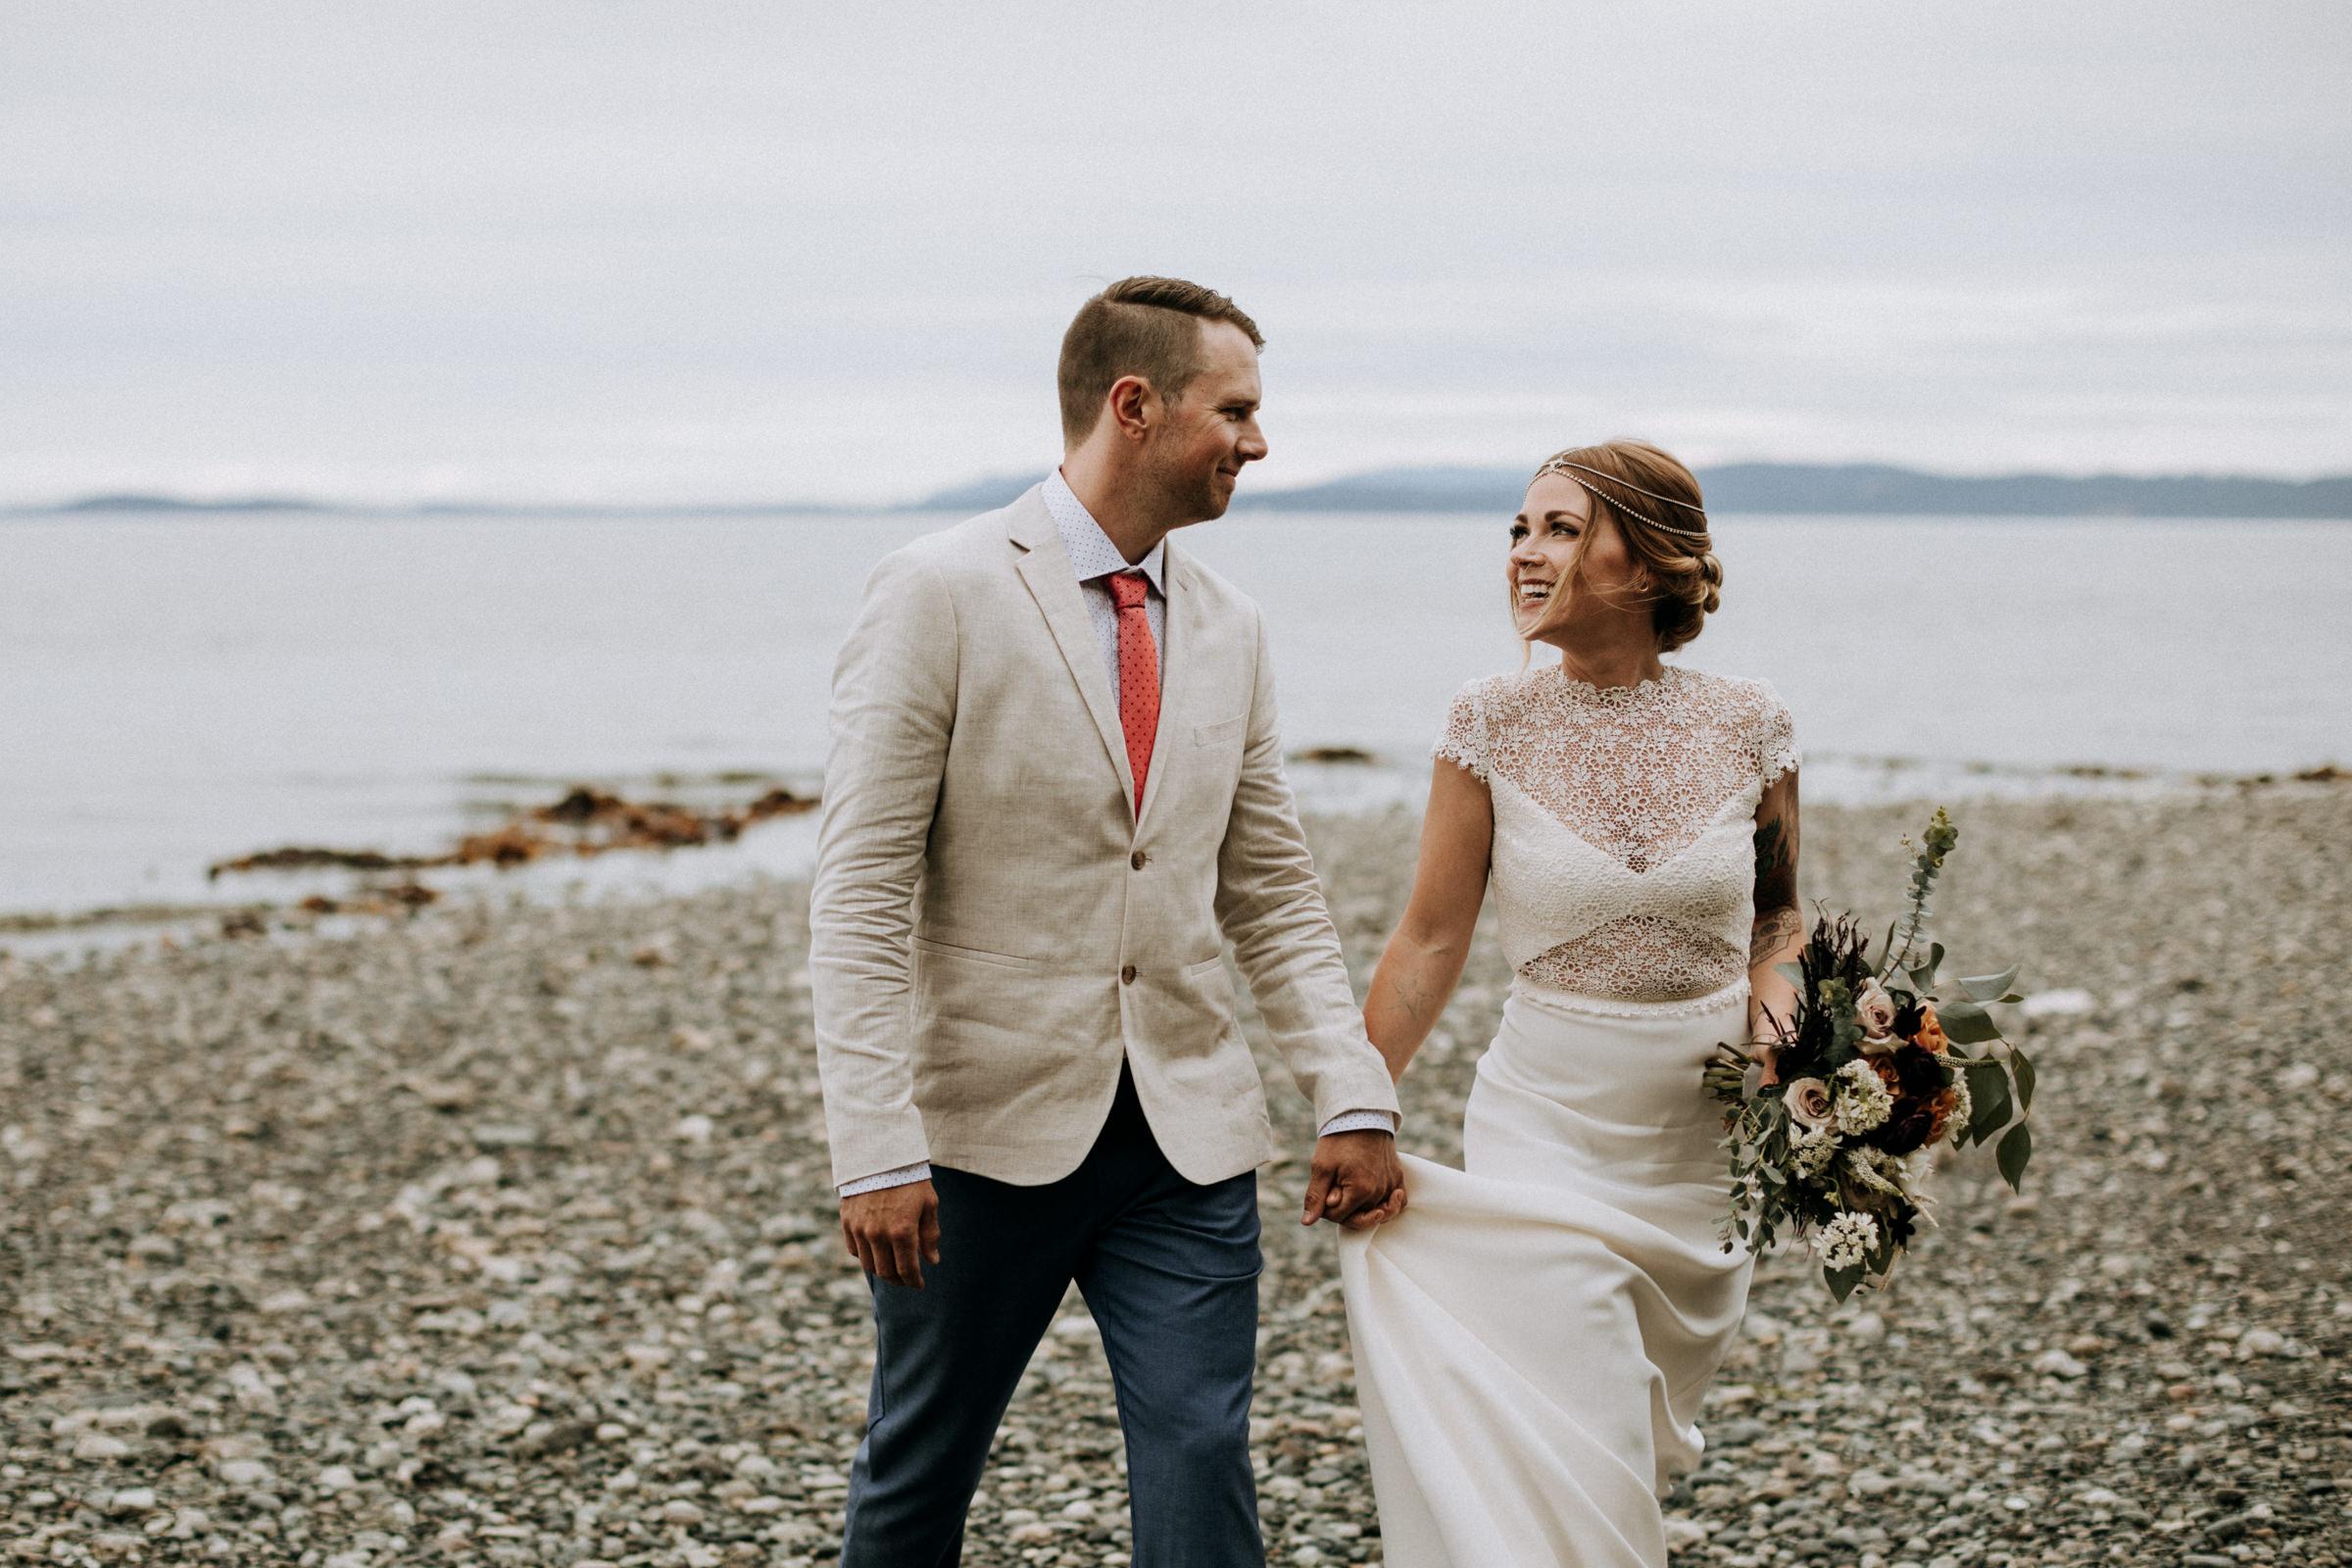 bride and groom walks on beach to ceremony, Victoria elopement photographer